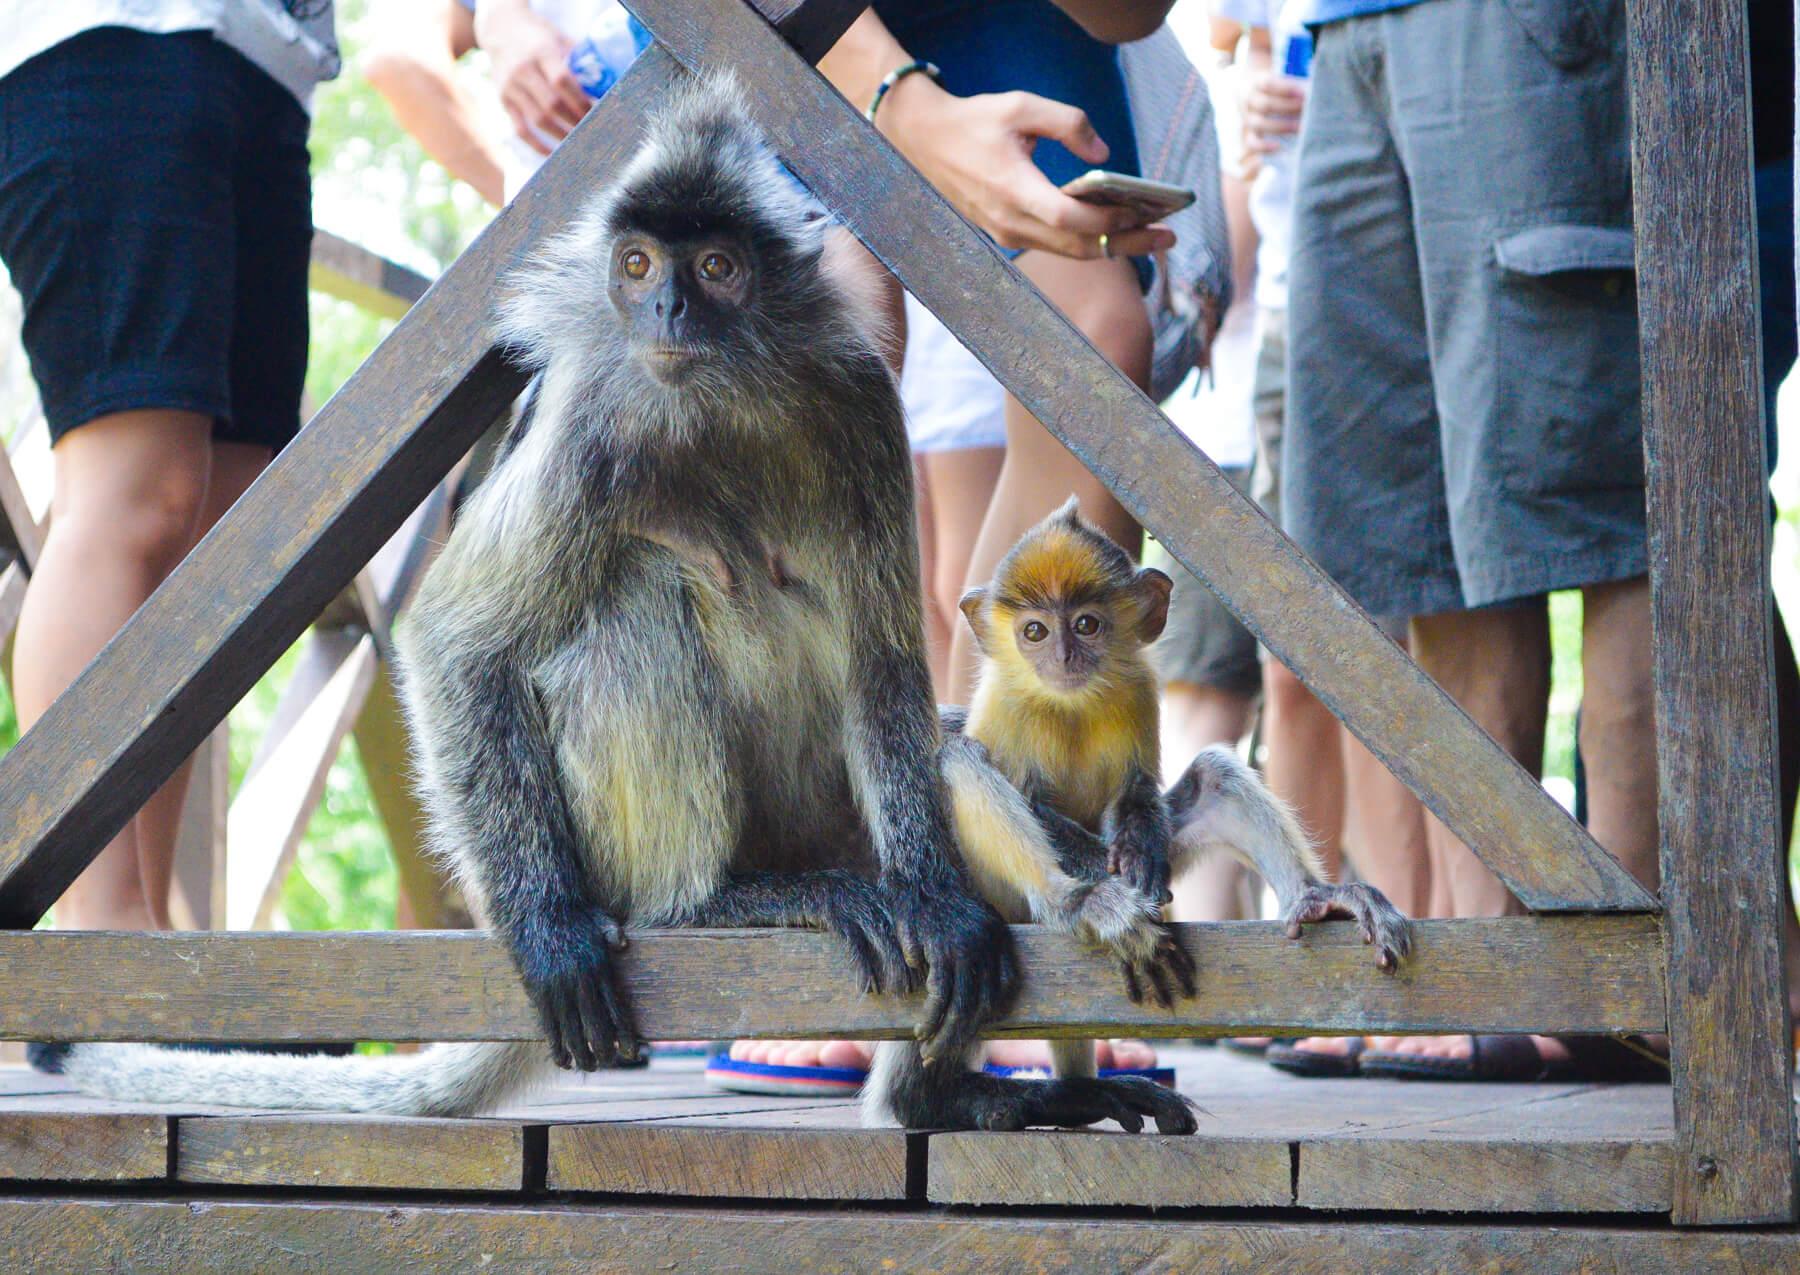 A silver leaf monkey and baby sitting on a railing